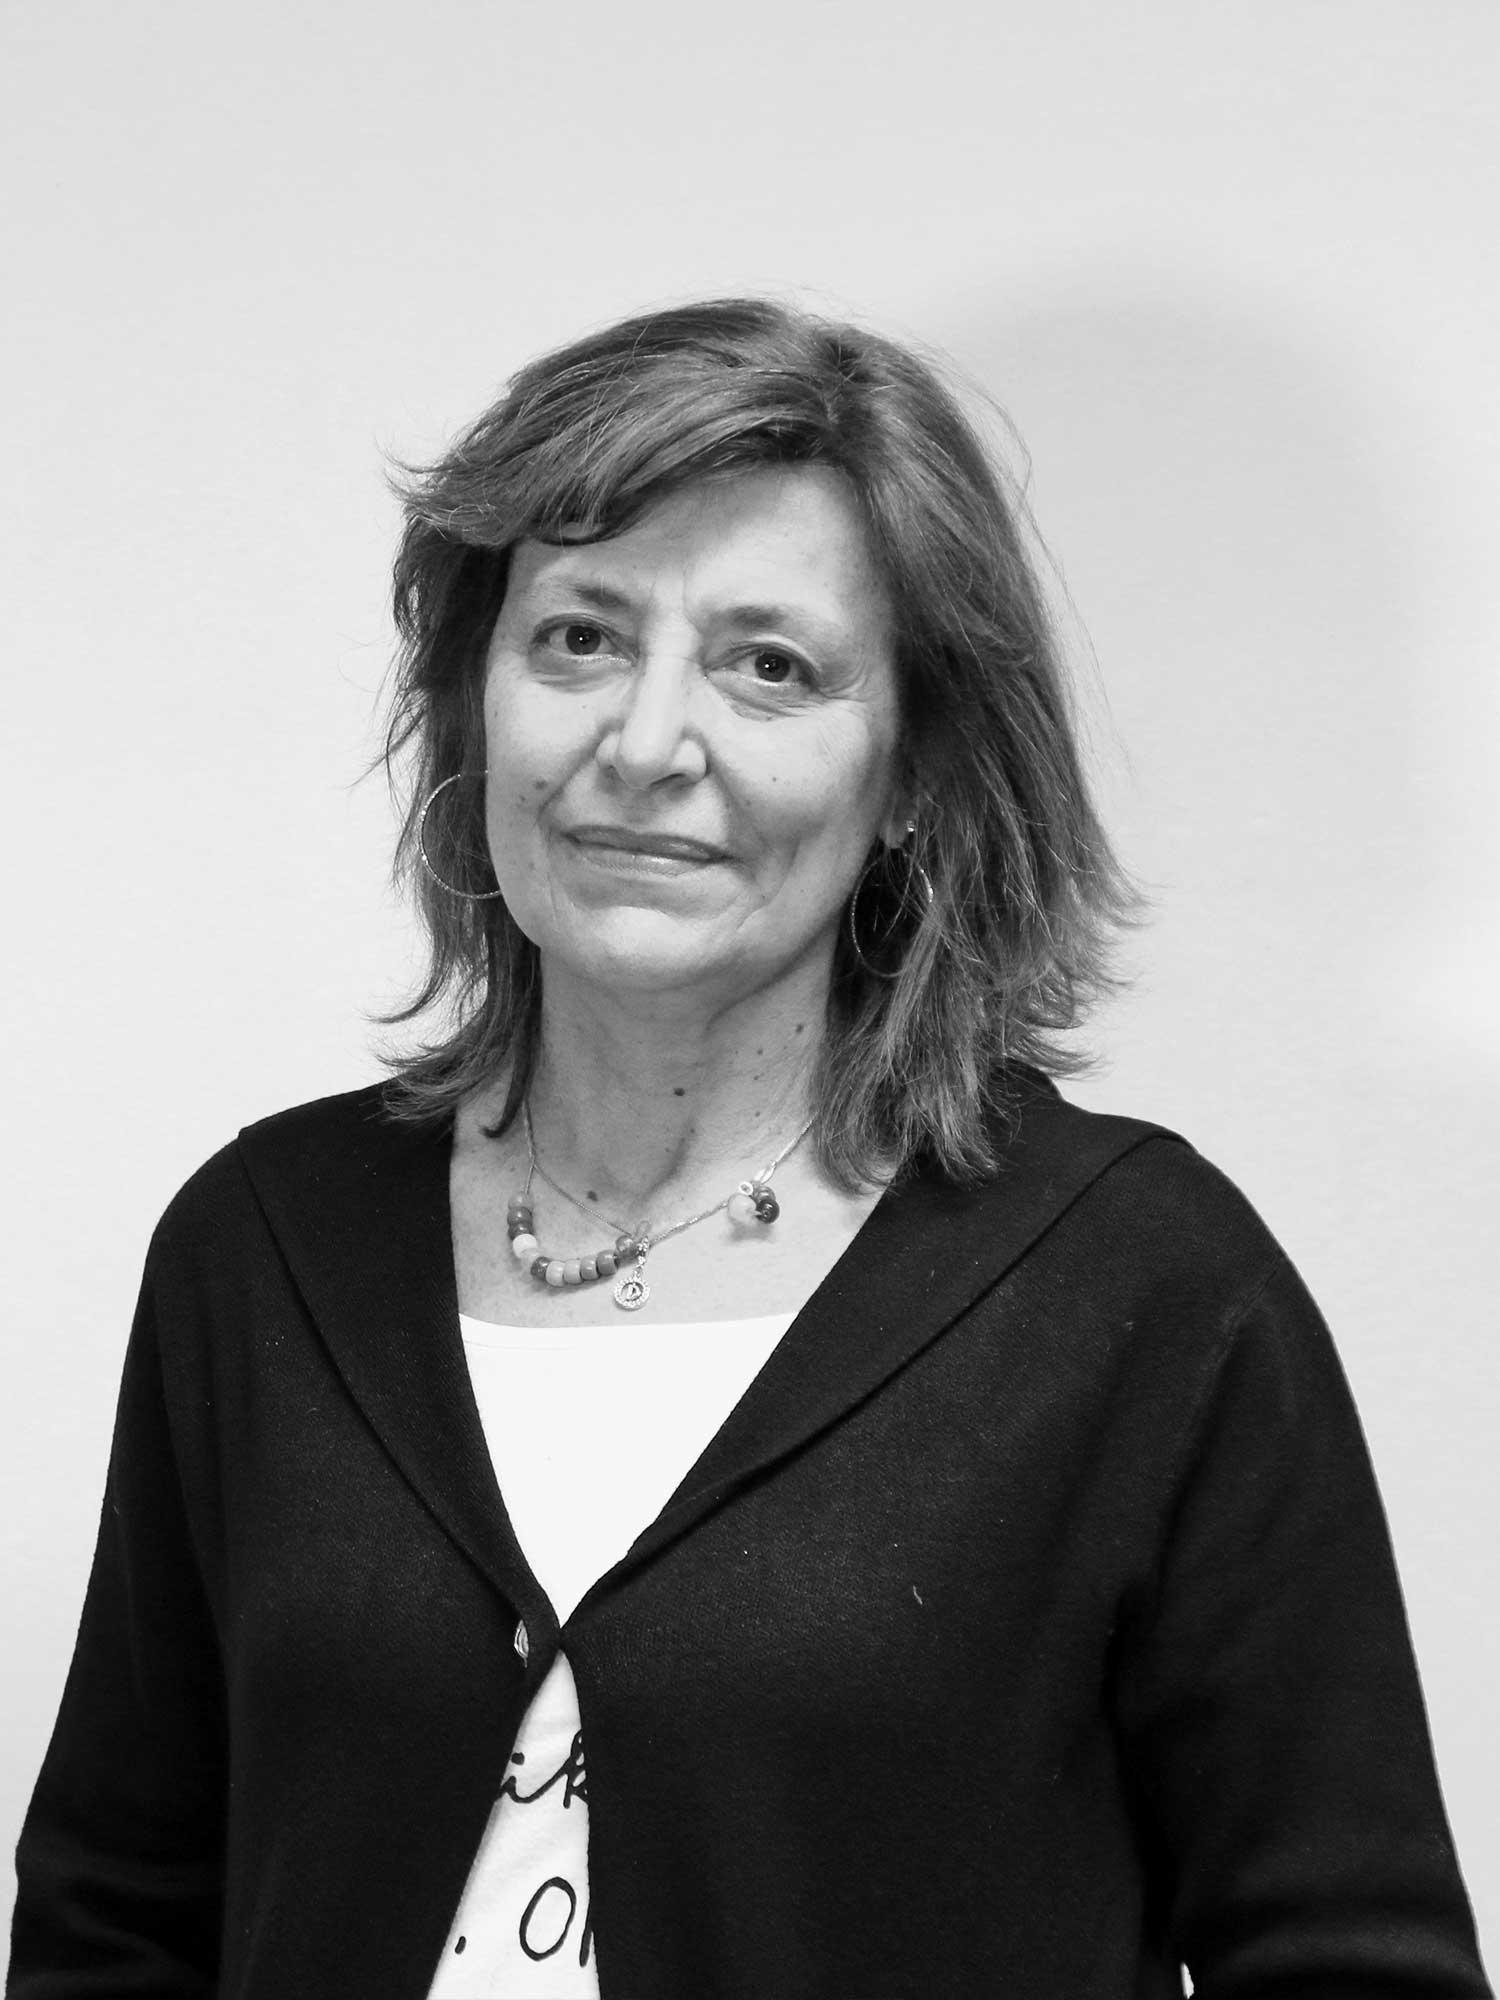 Daniela Fontana